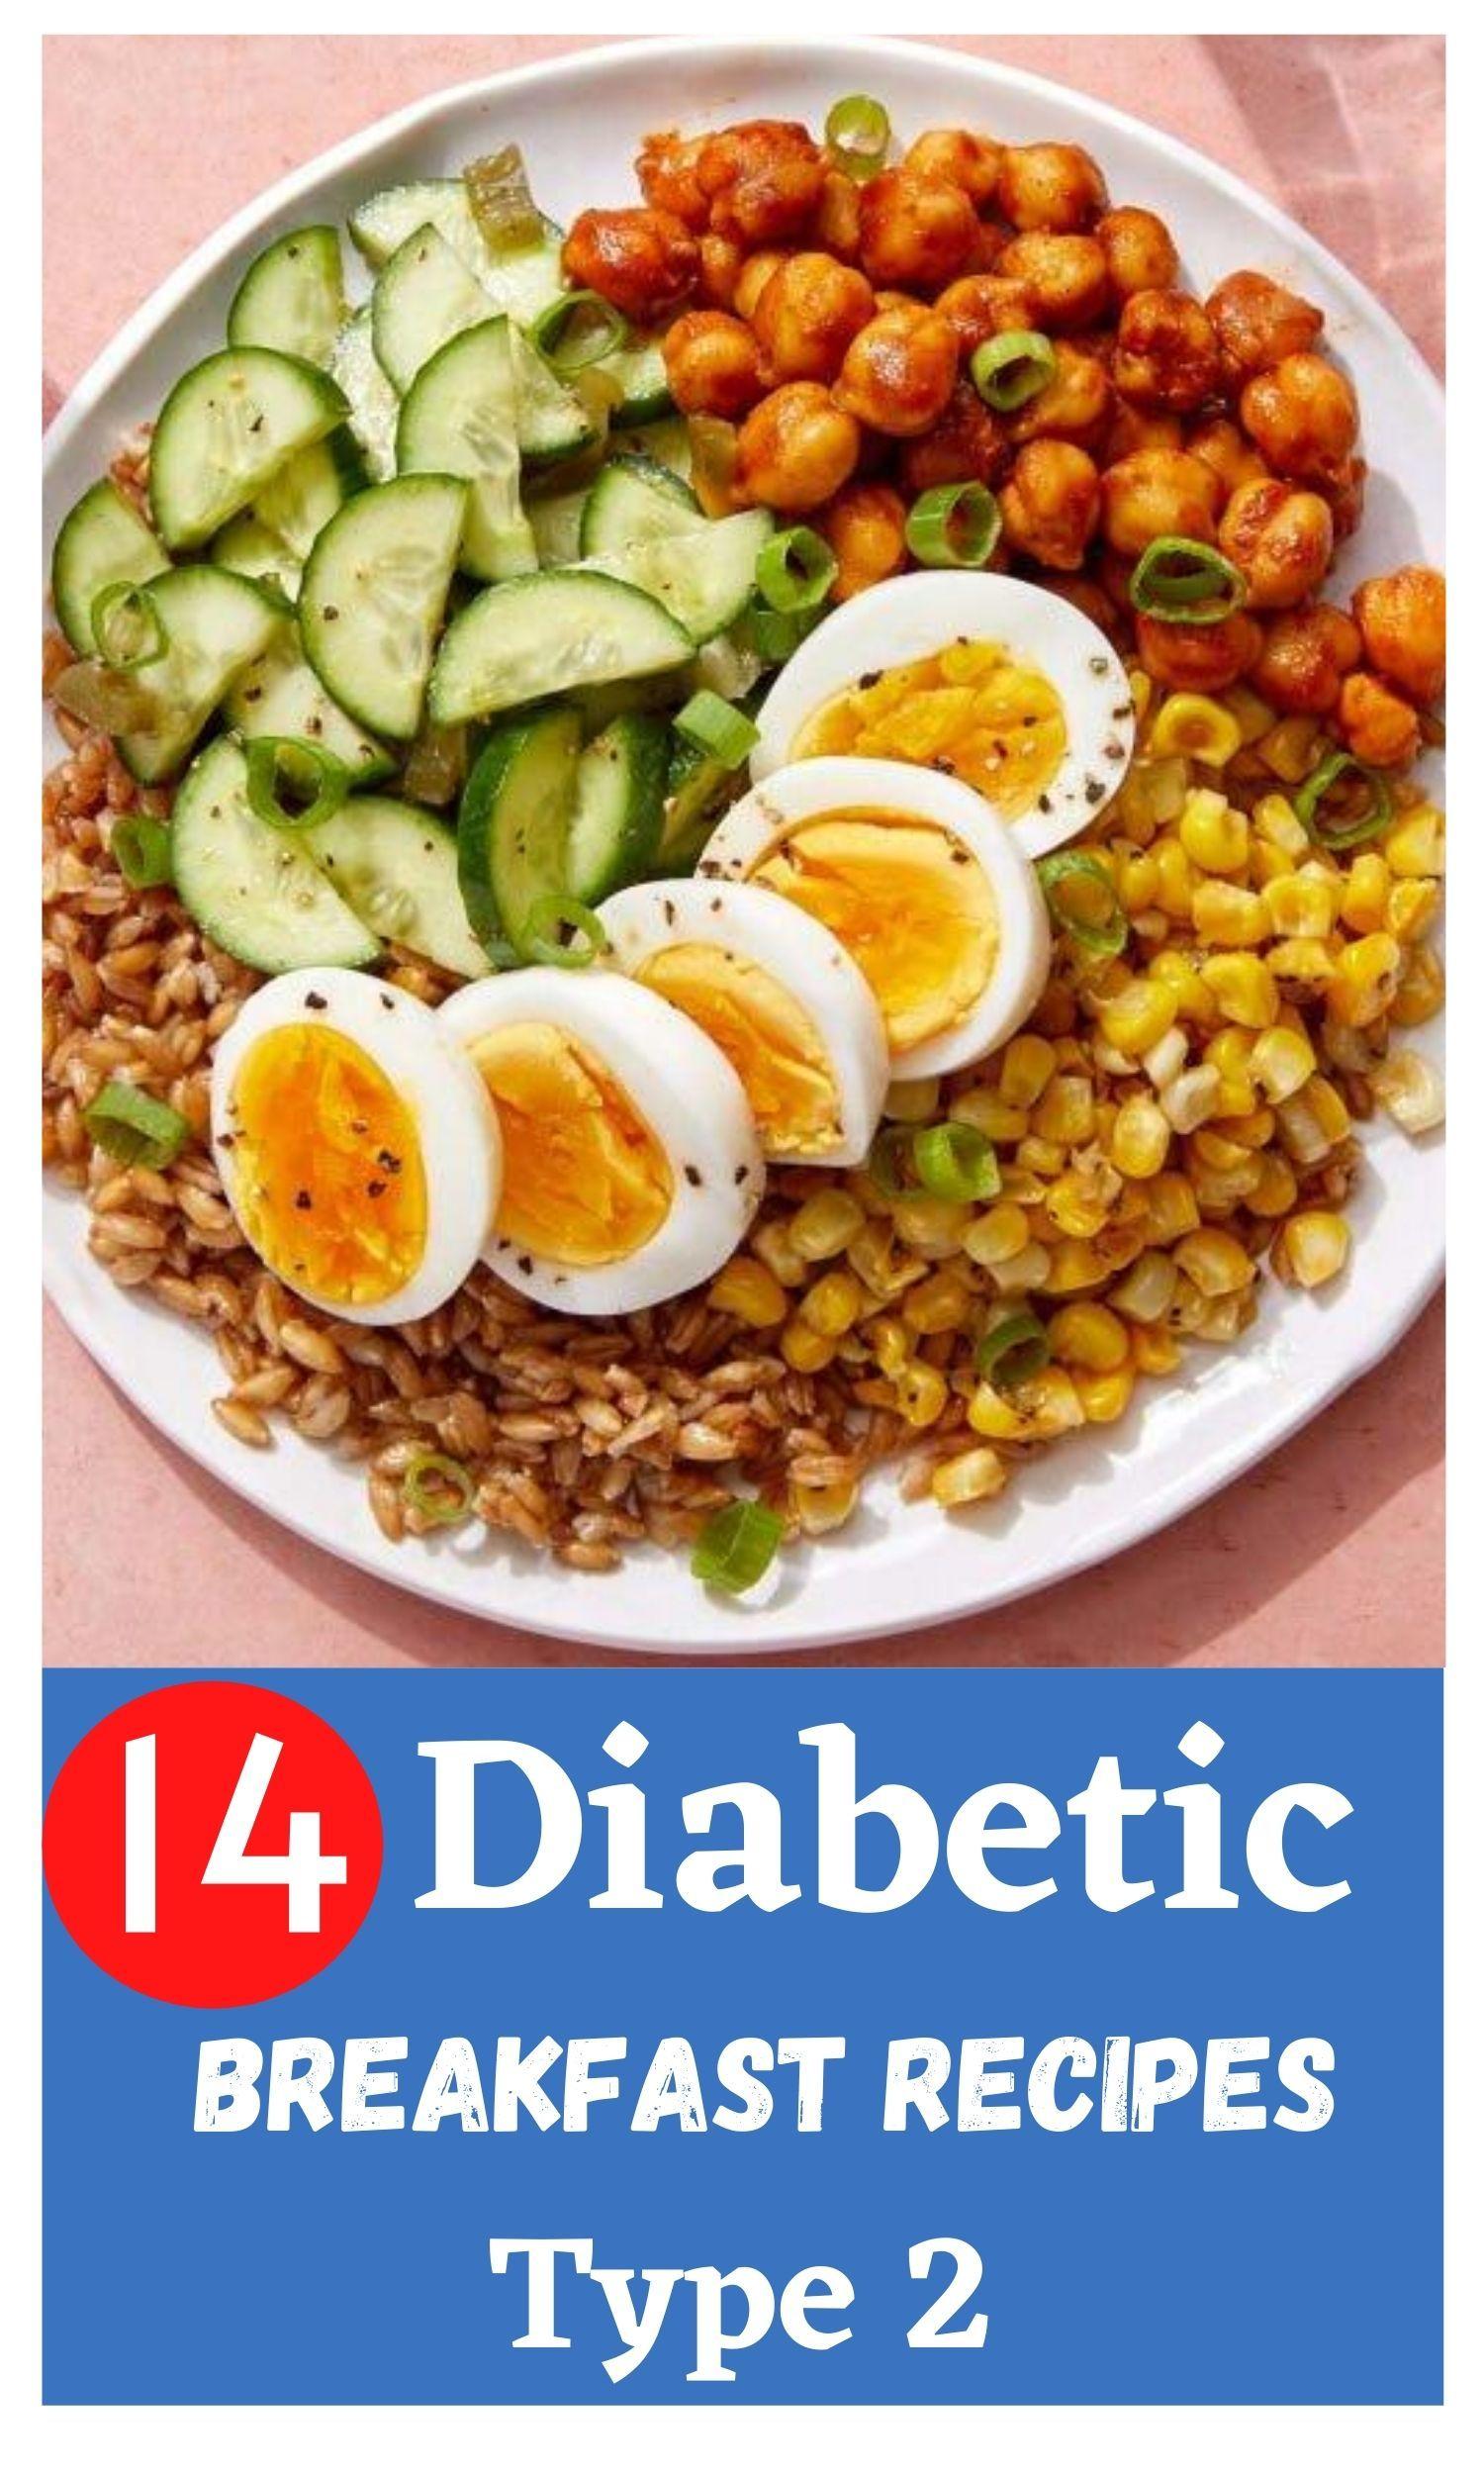 14 Diabetic Breakfast Recipes Type 2 Diabetes Friendly Recipes Diabetic Breakfast Recipes Diabetic Friendly Dinner Recipes